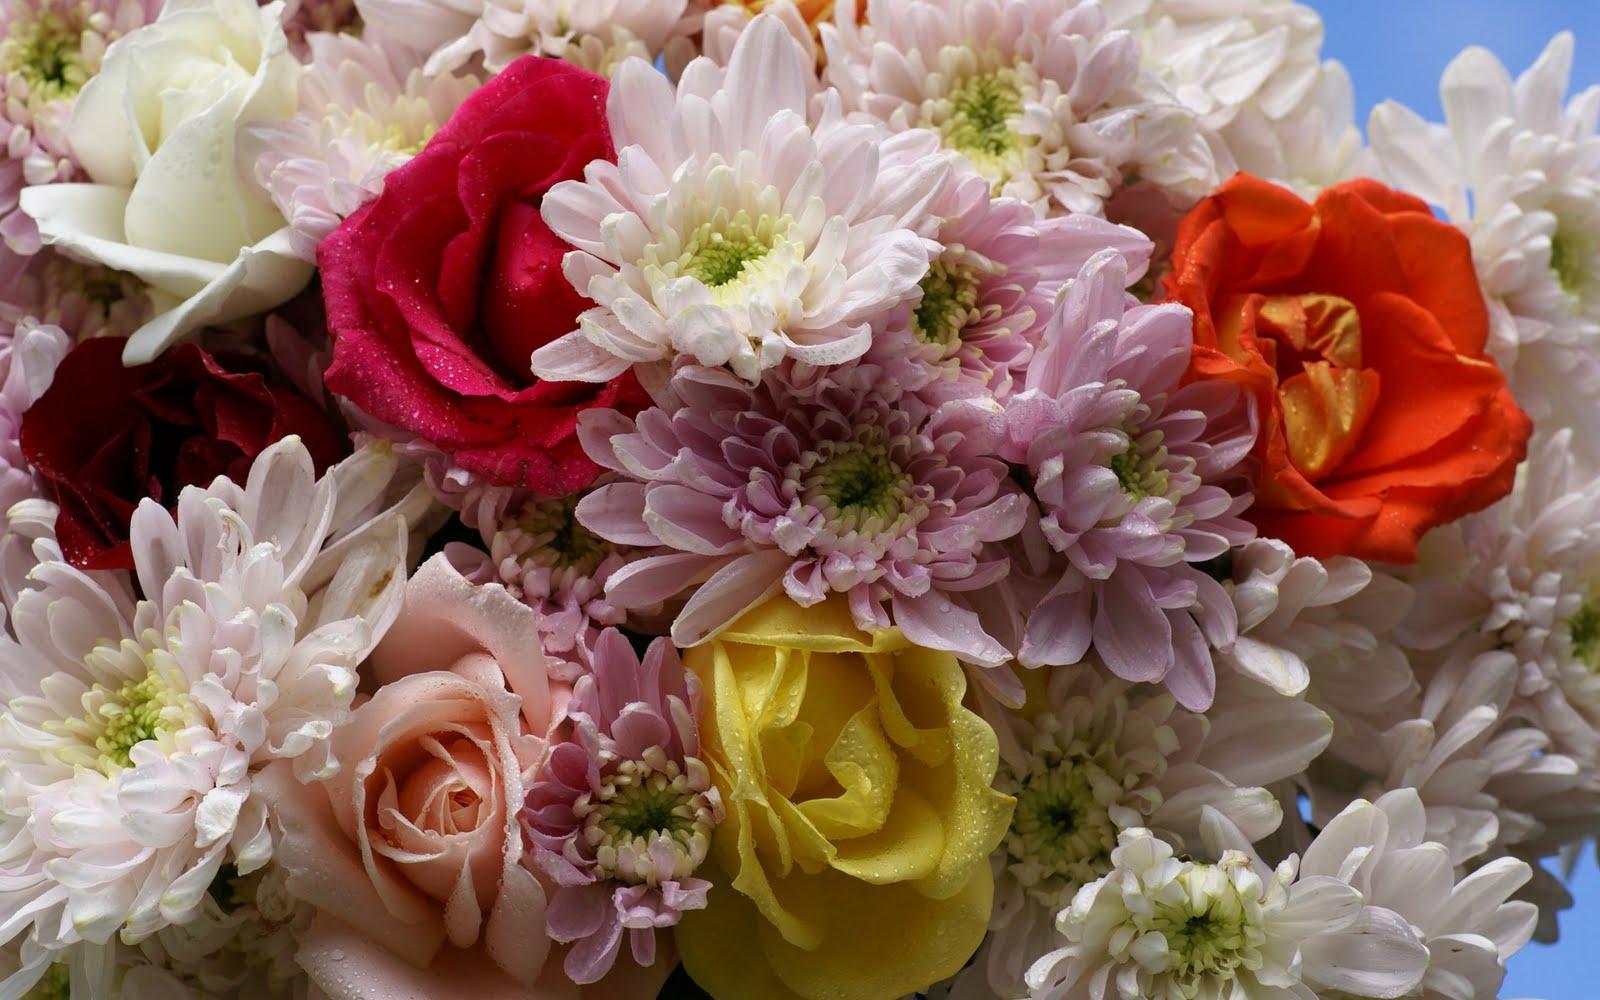 http://3.bp.blogspot.com/_BEyQraI-KQQ/SxSwtsRS32I/AAAAAAAADtM/pOm1jmng0FE/s1600/roses-dsc01913.jpg